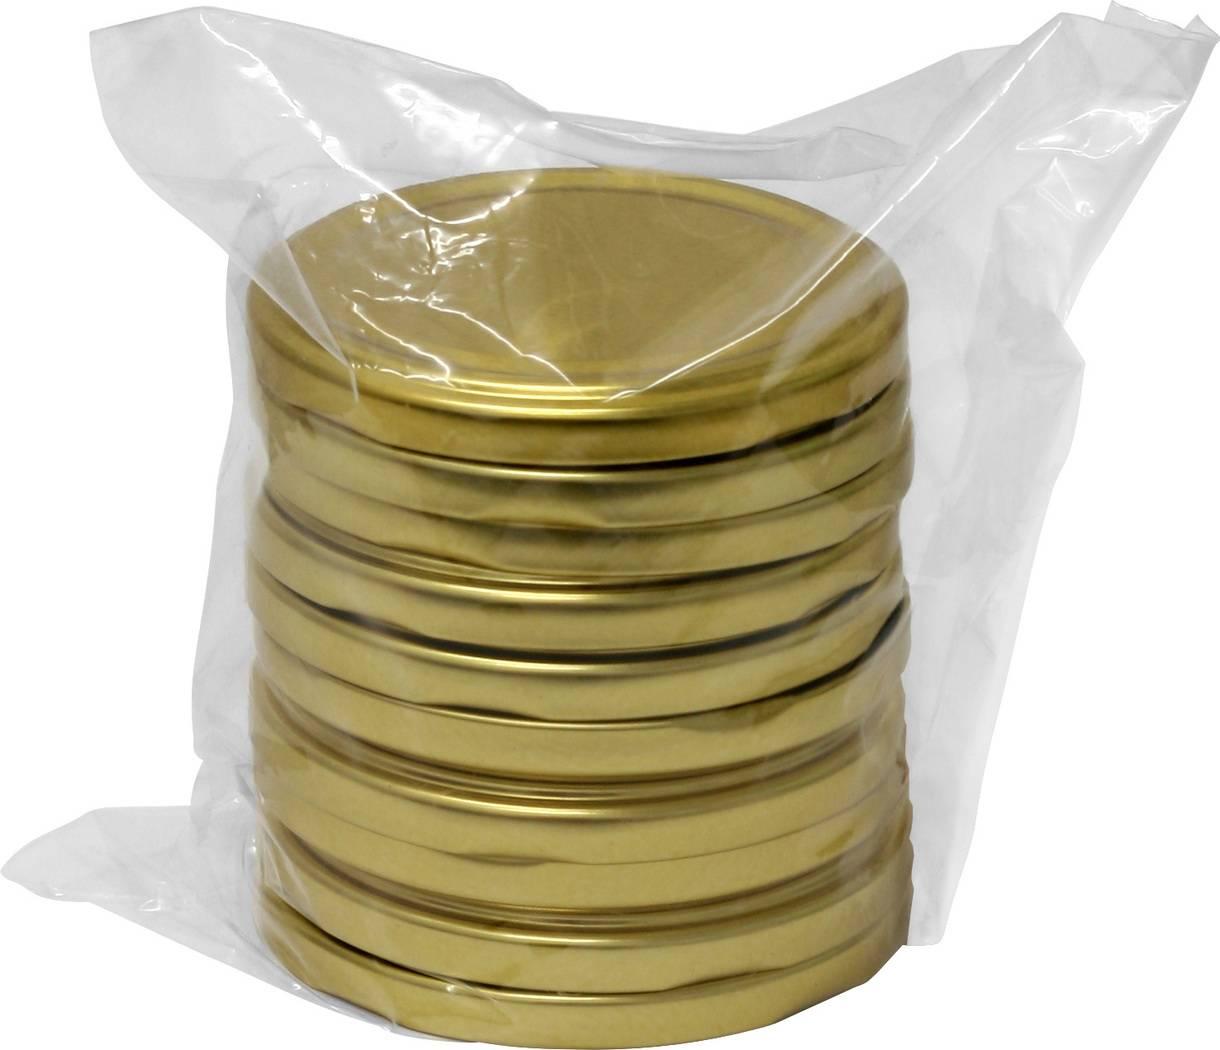 Víčka 82/4 - 10ks zlaté - BIOWIN